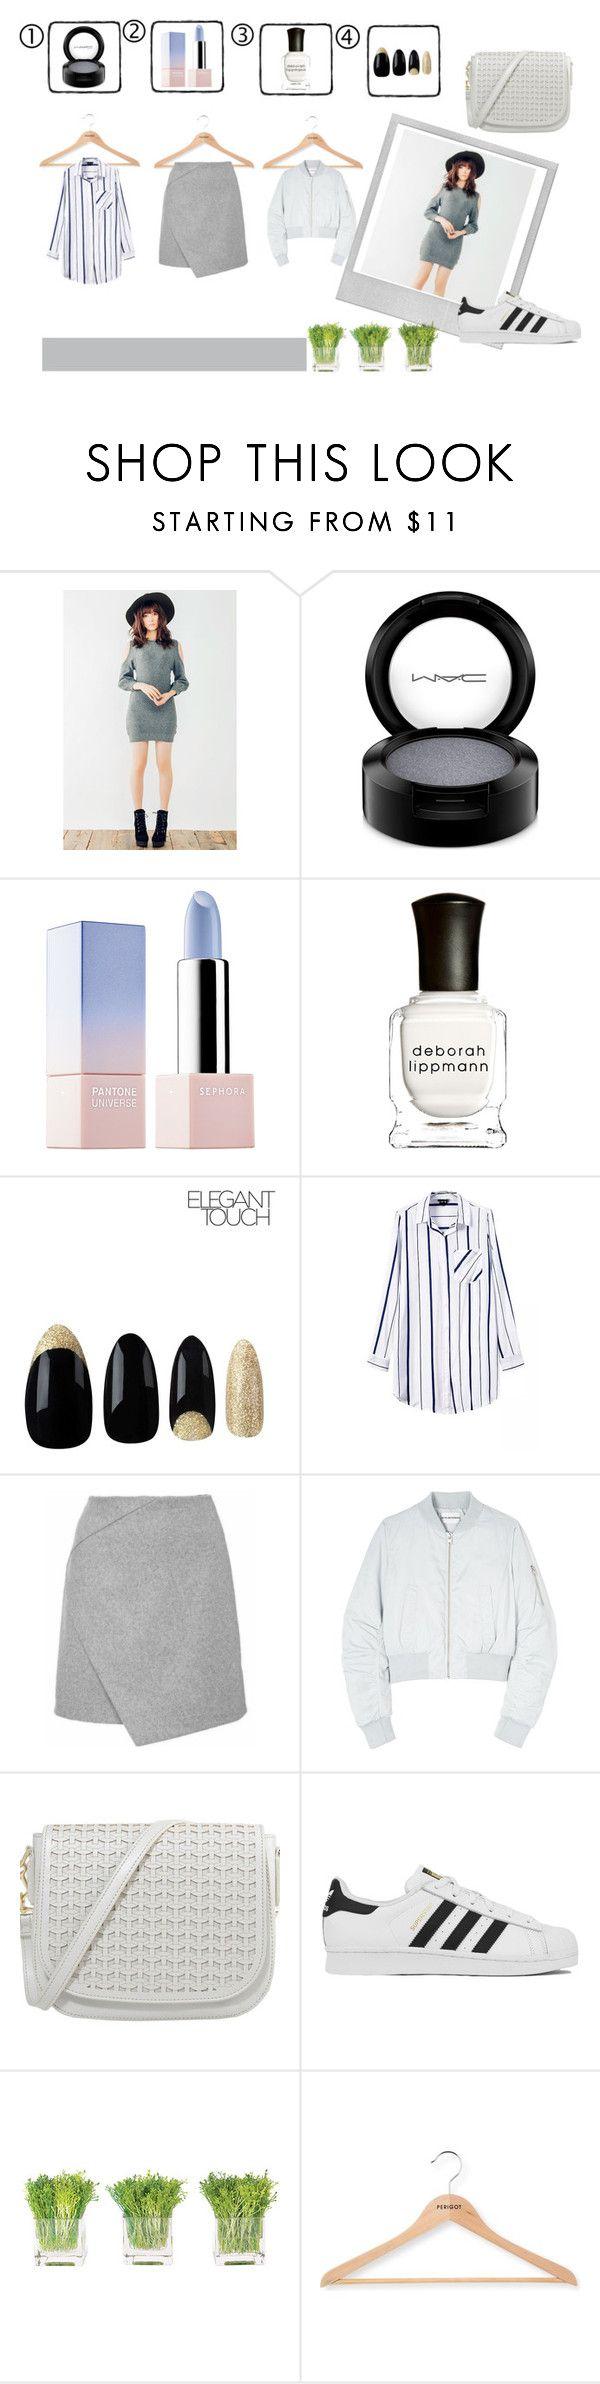 """geunine-people"" by v-papas on Polyvore featuring MAC Cosmetics, Sephora Collection, Deborah Lippmann, Won Hundred, adidas, NDI, Polaroid, PERIGOT, women's clothing and women"